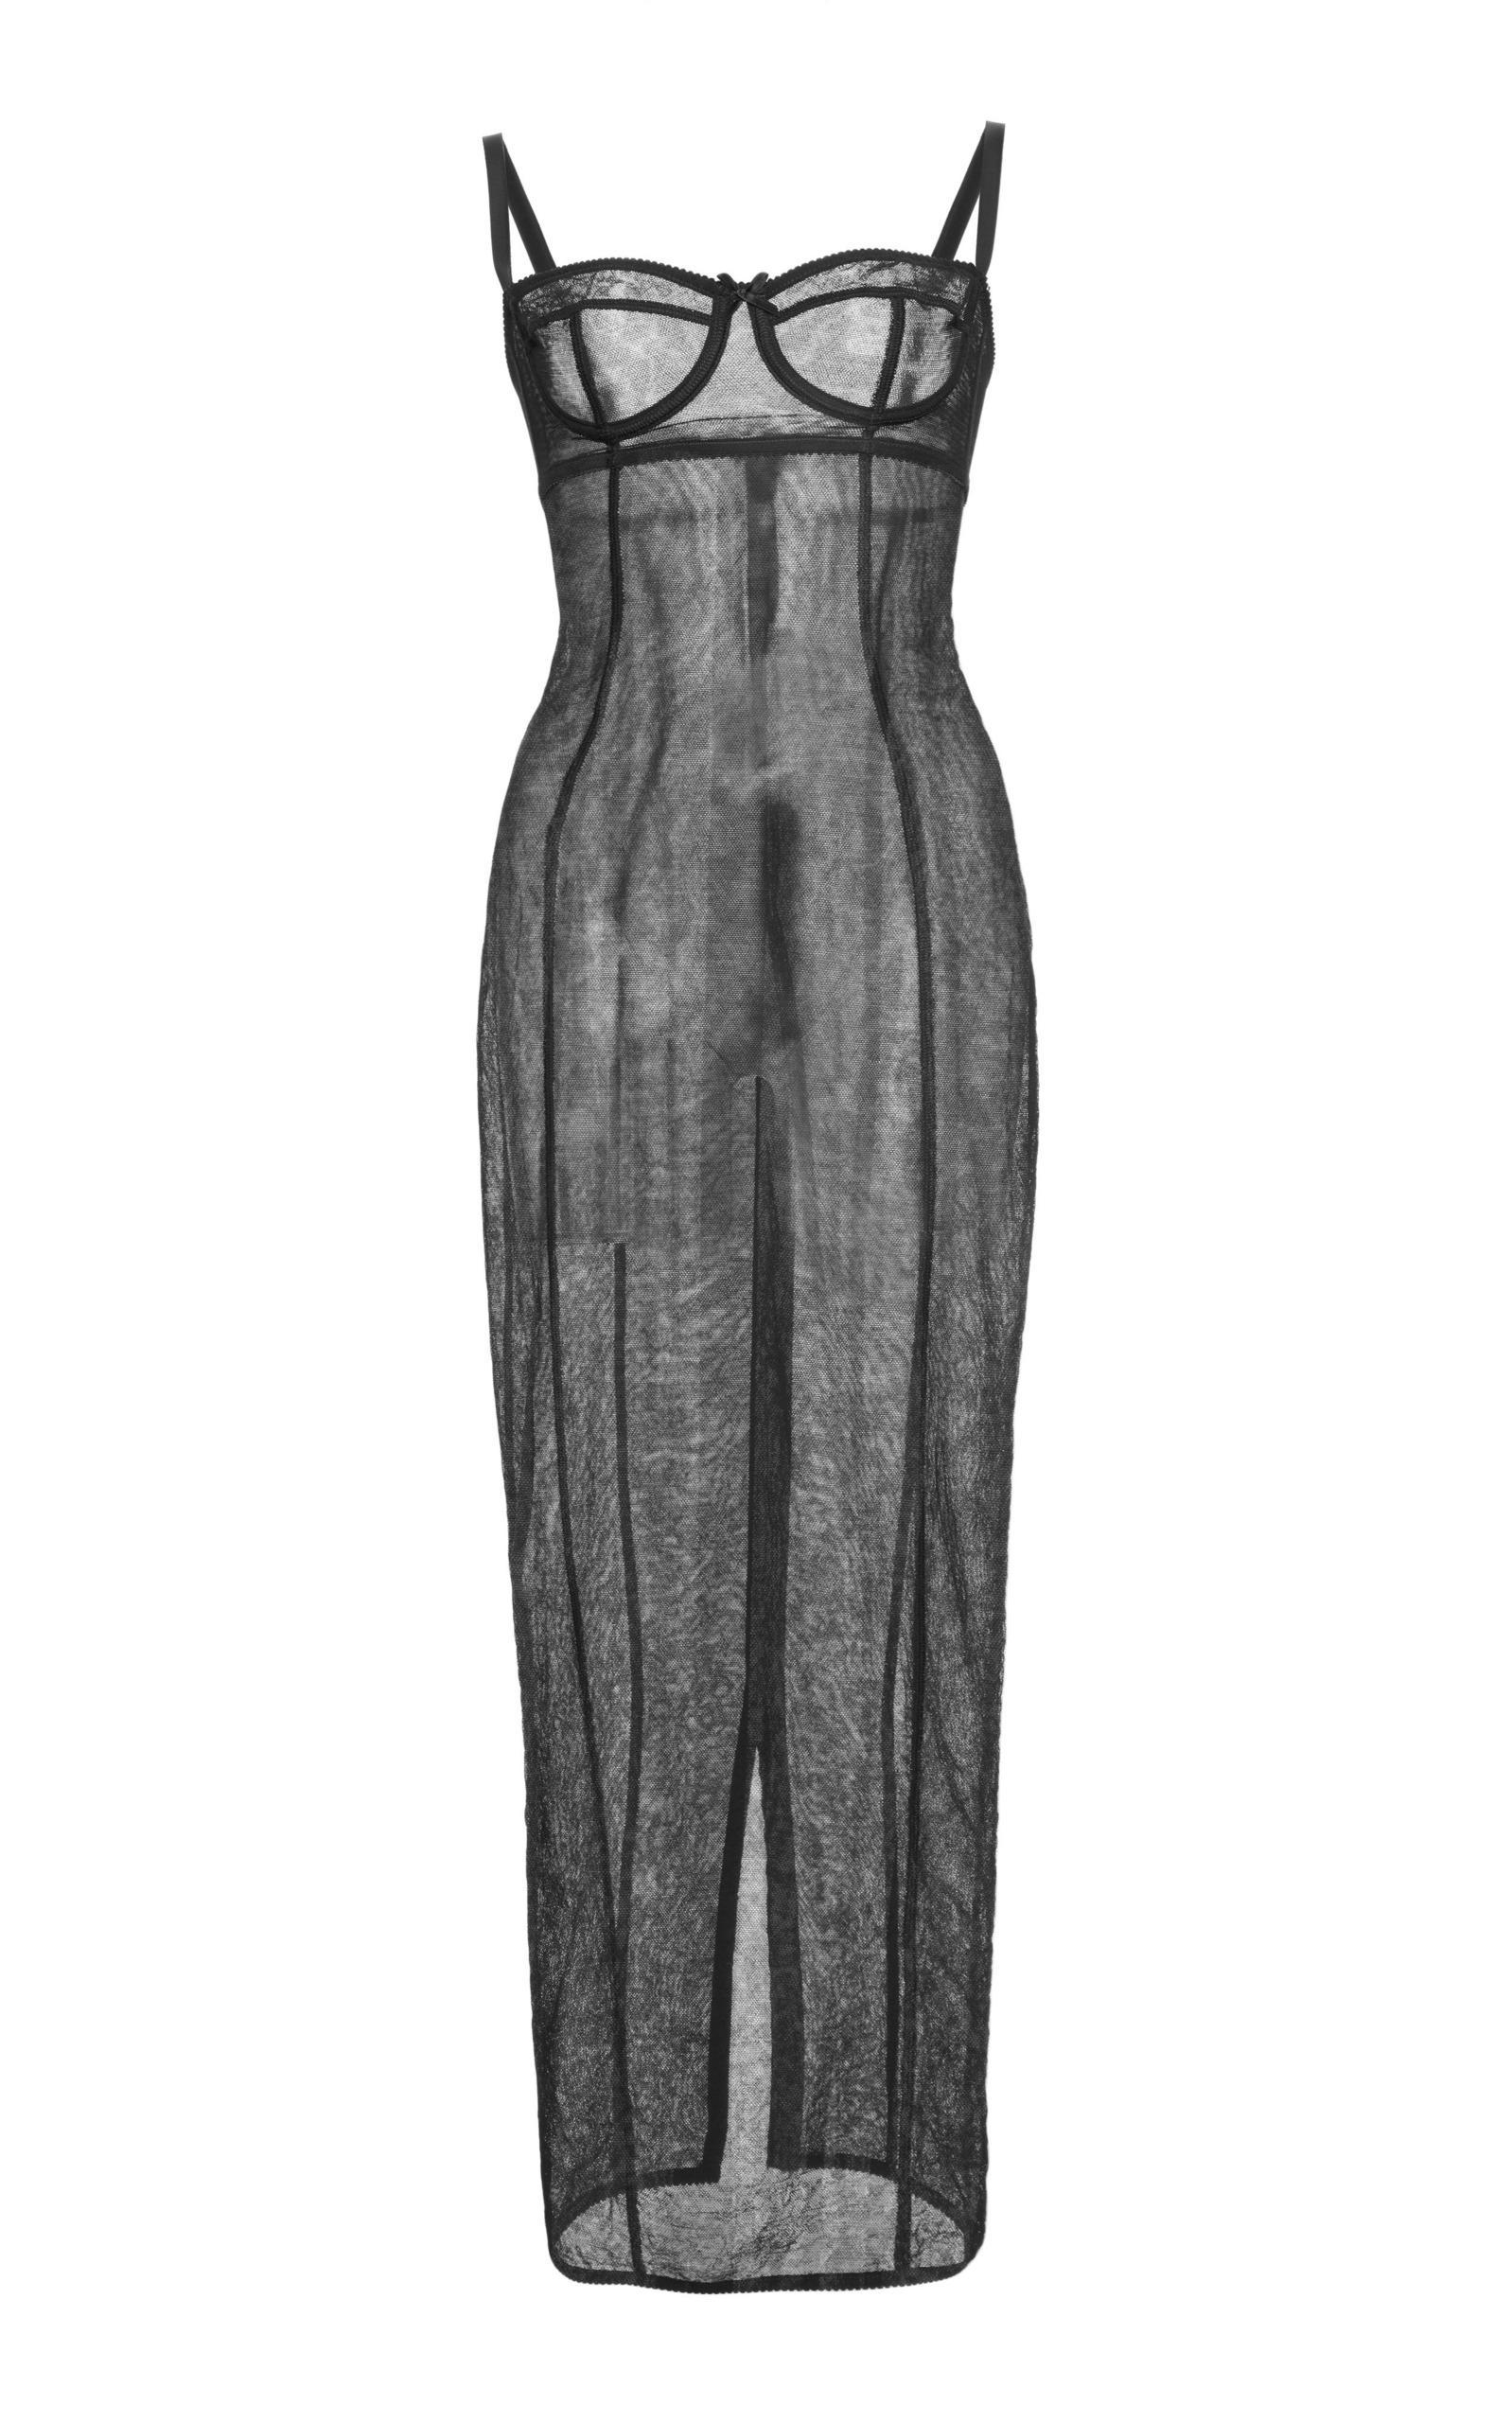 Dolce & Gabbana Ruched Tank Dress In Black